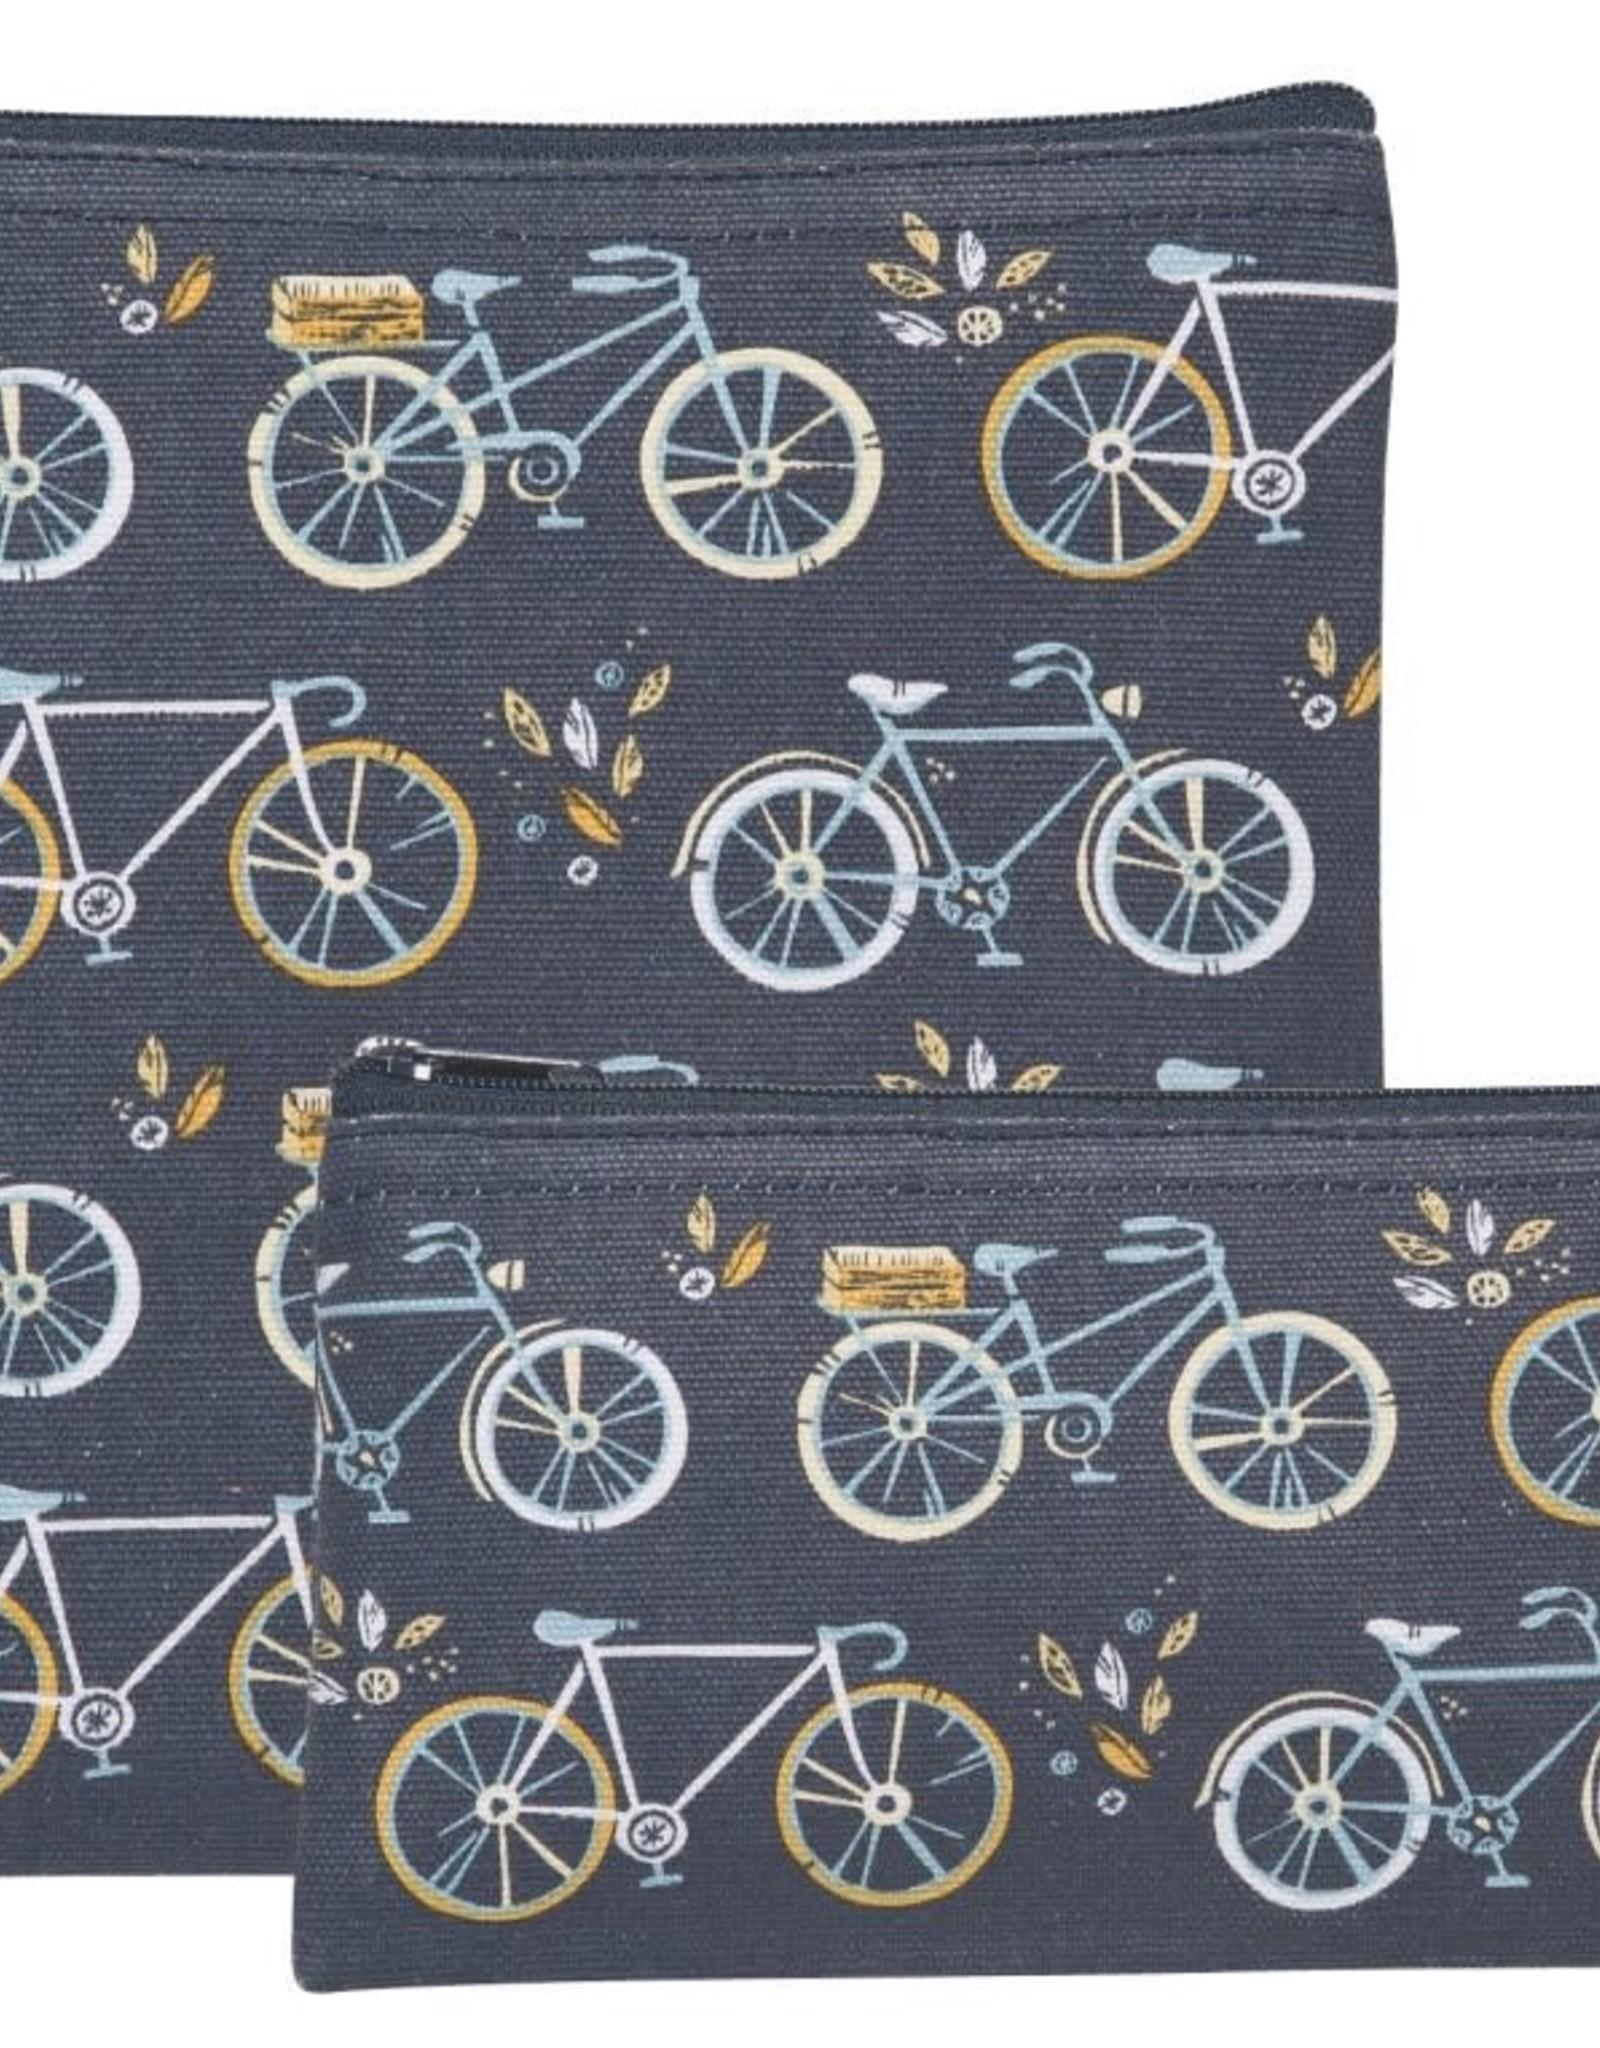 Ens 2 sacs à collation - Vélo